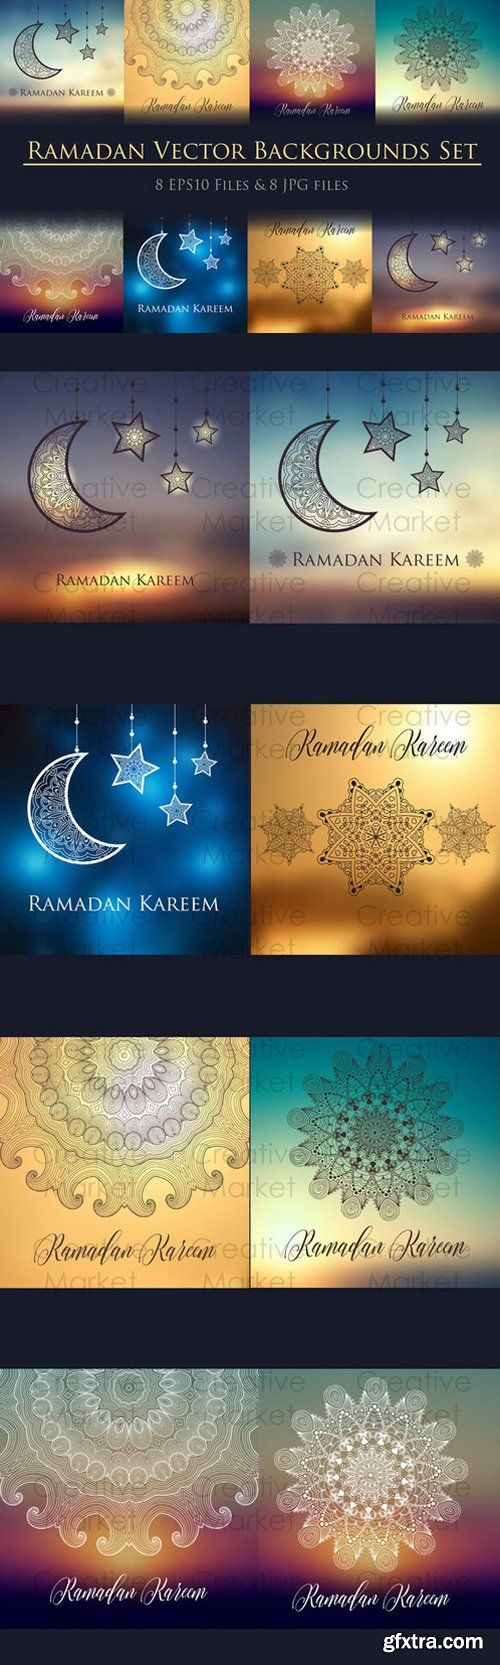 CM - 8 Ramadan backgrounds vector set 703856 http://webtutorsliv.ml/threads/cm-8-ramadan-backgrounds-vector-set-703856.10672/